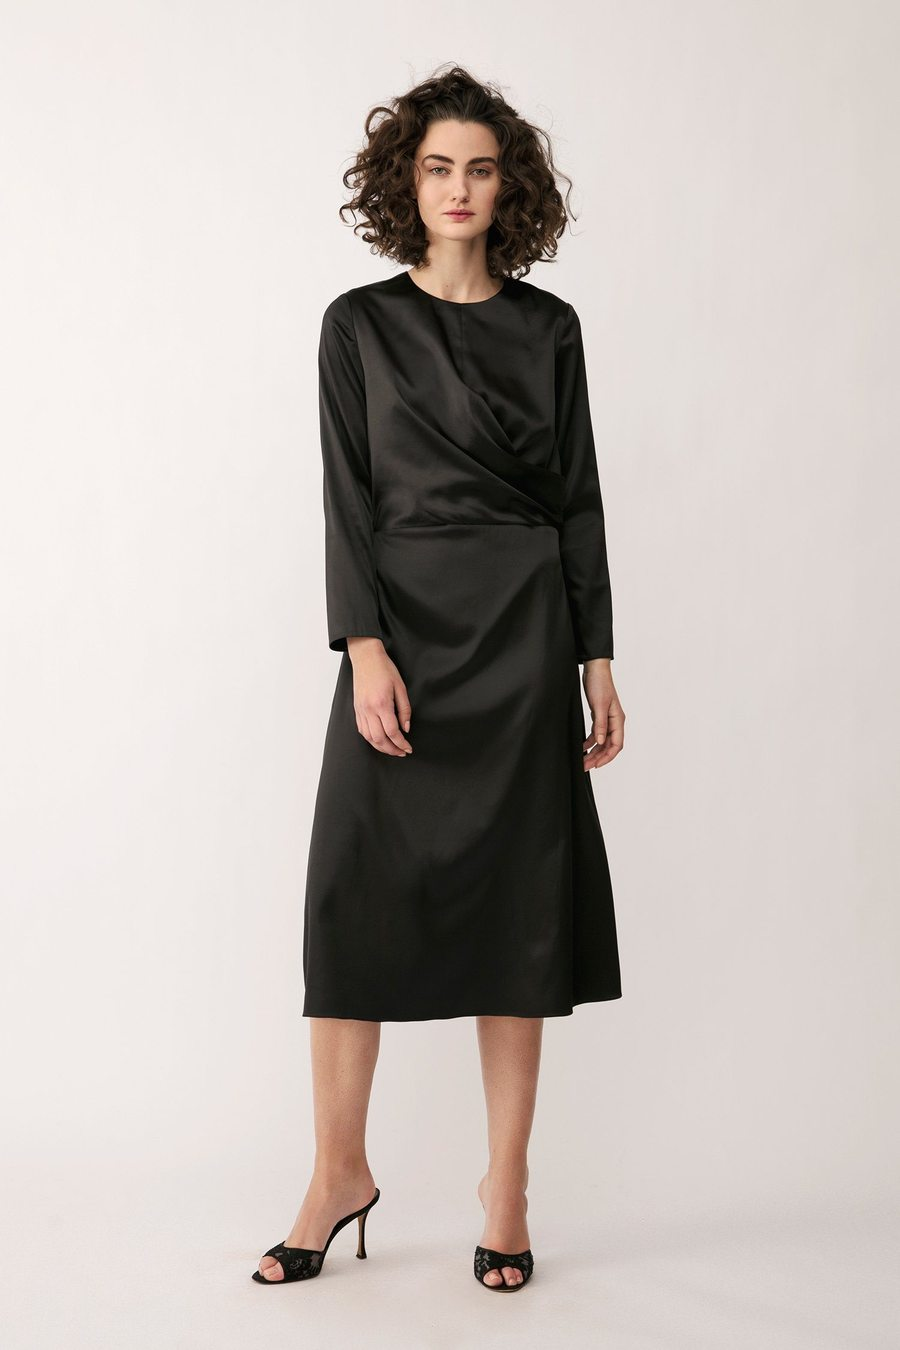 milano-dress-black-dress-stylein-222546_900x.jpg